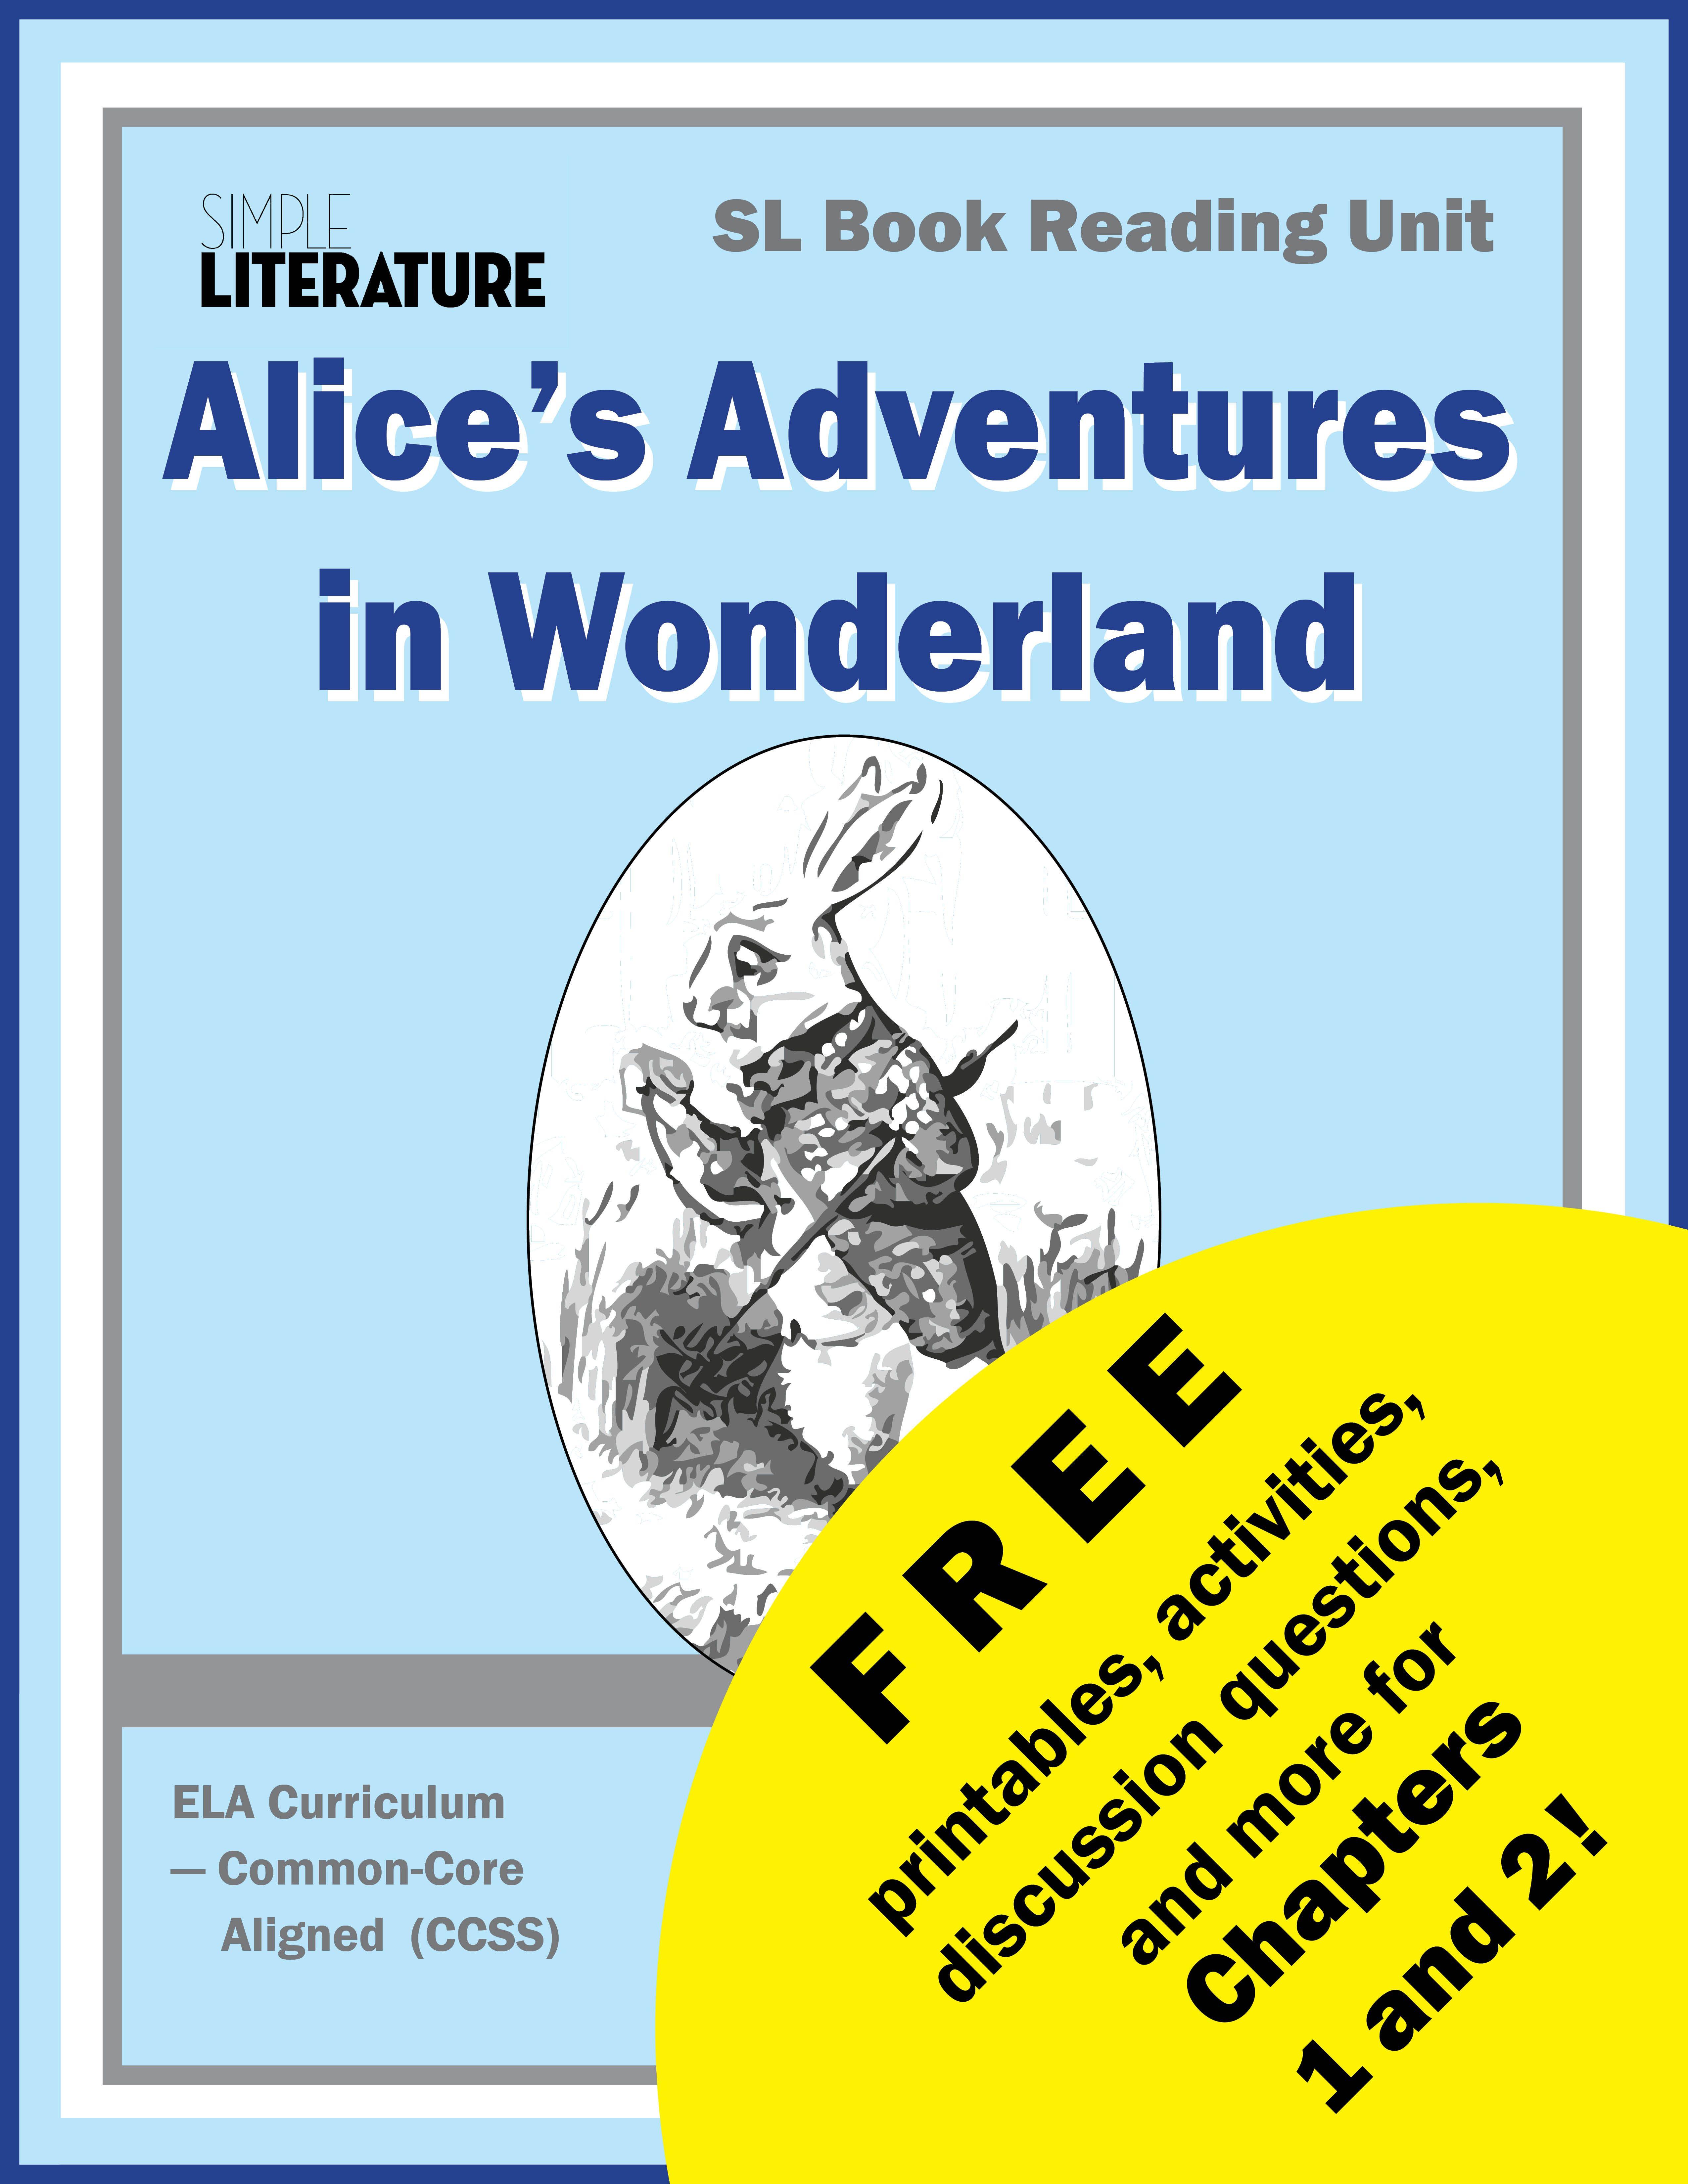 Alice In Wonderland Book Cover Ideas ~ Free download. alices adventures in wonderland alice in